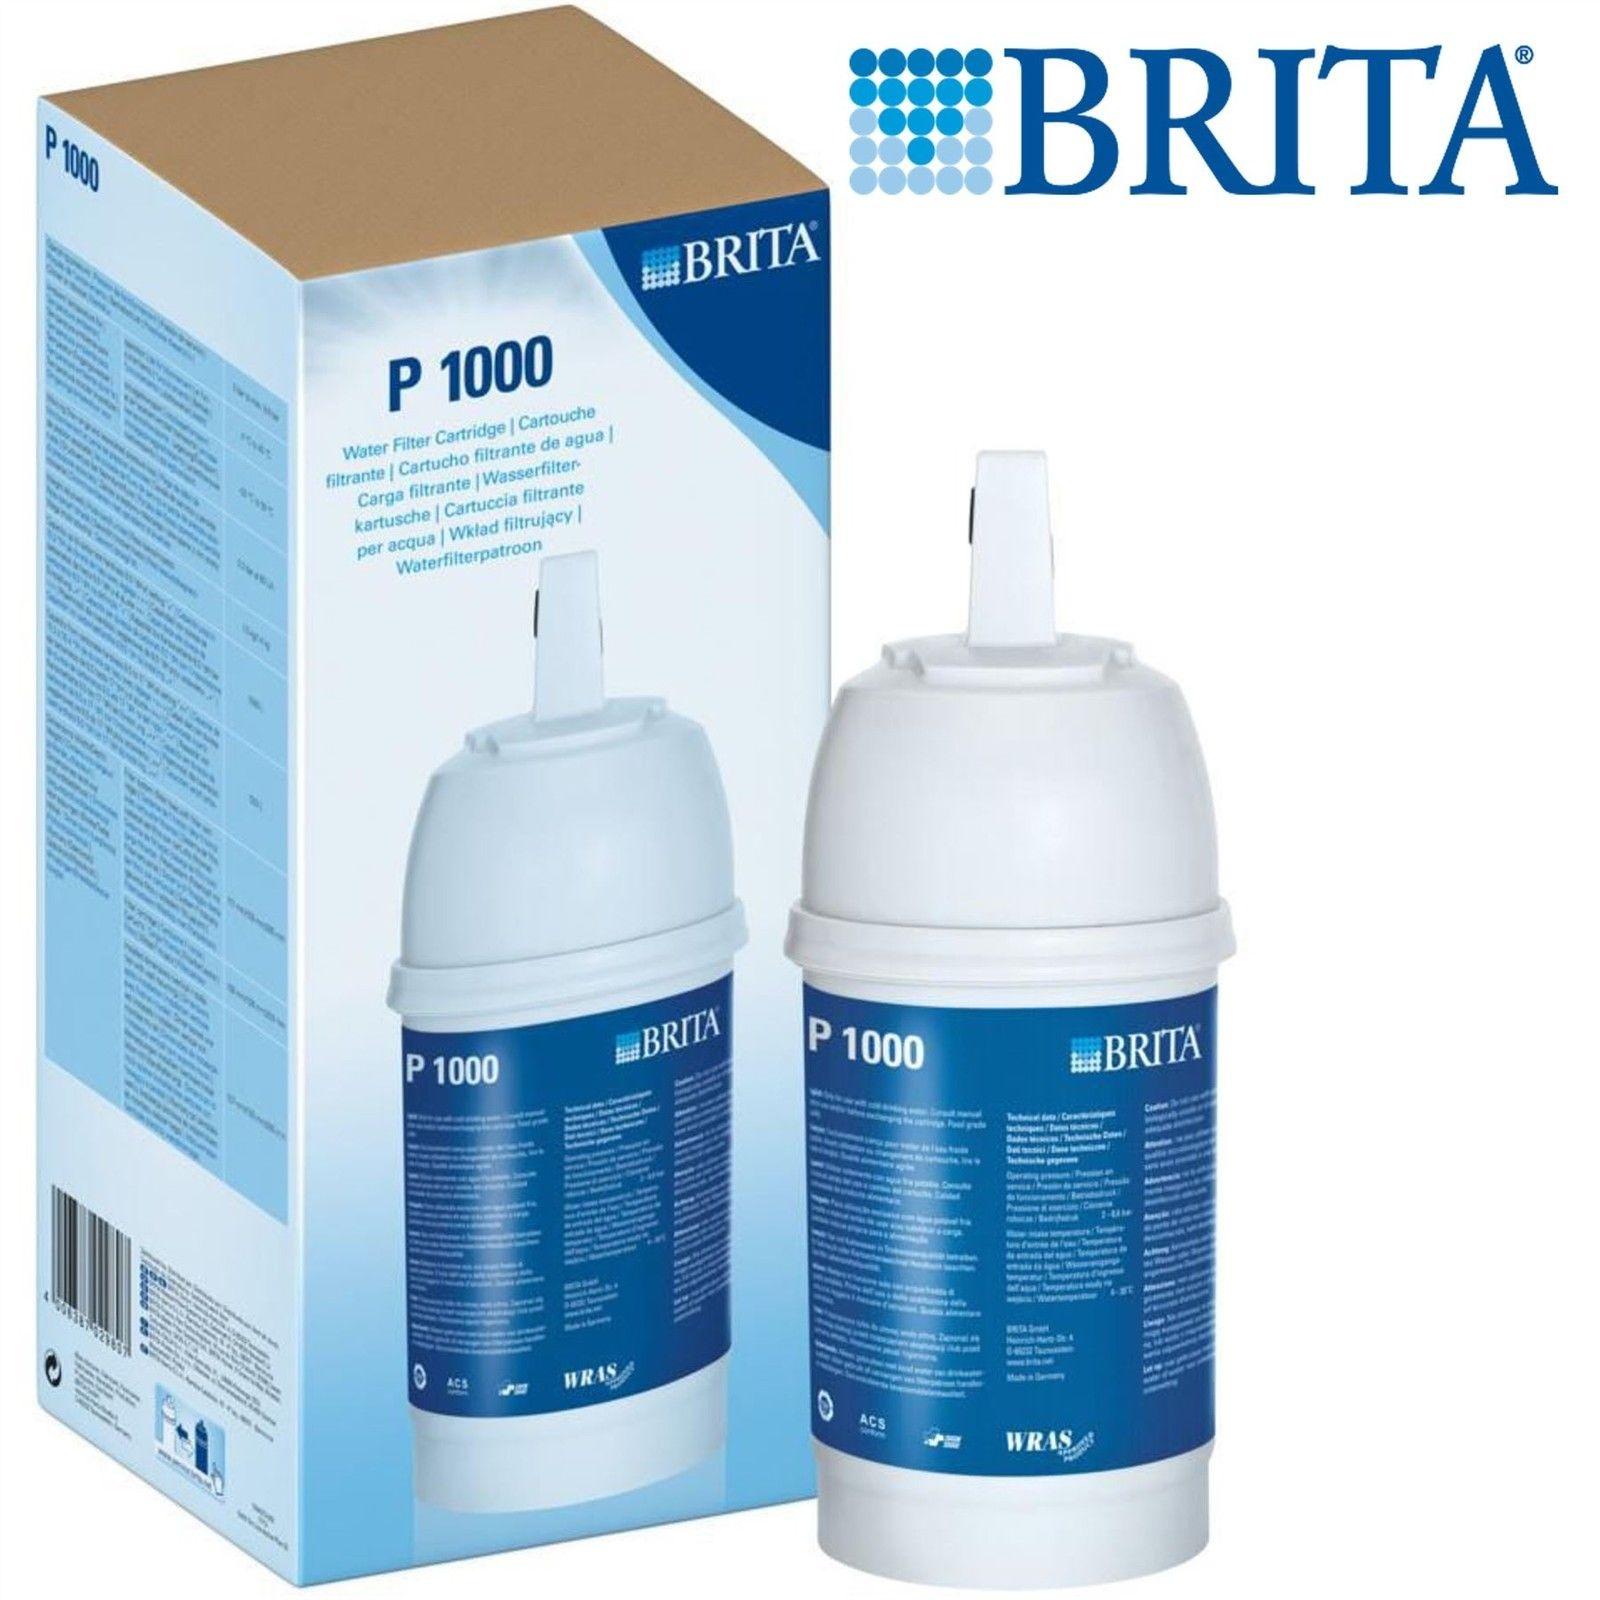 Brita P1000 Tap Water Filter Refill Genuine Replacement Kitchen Tap ...